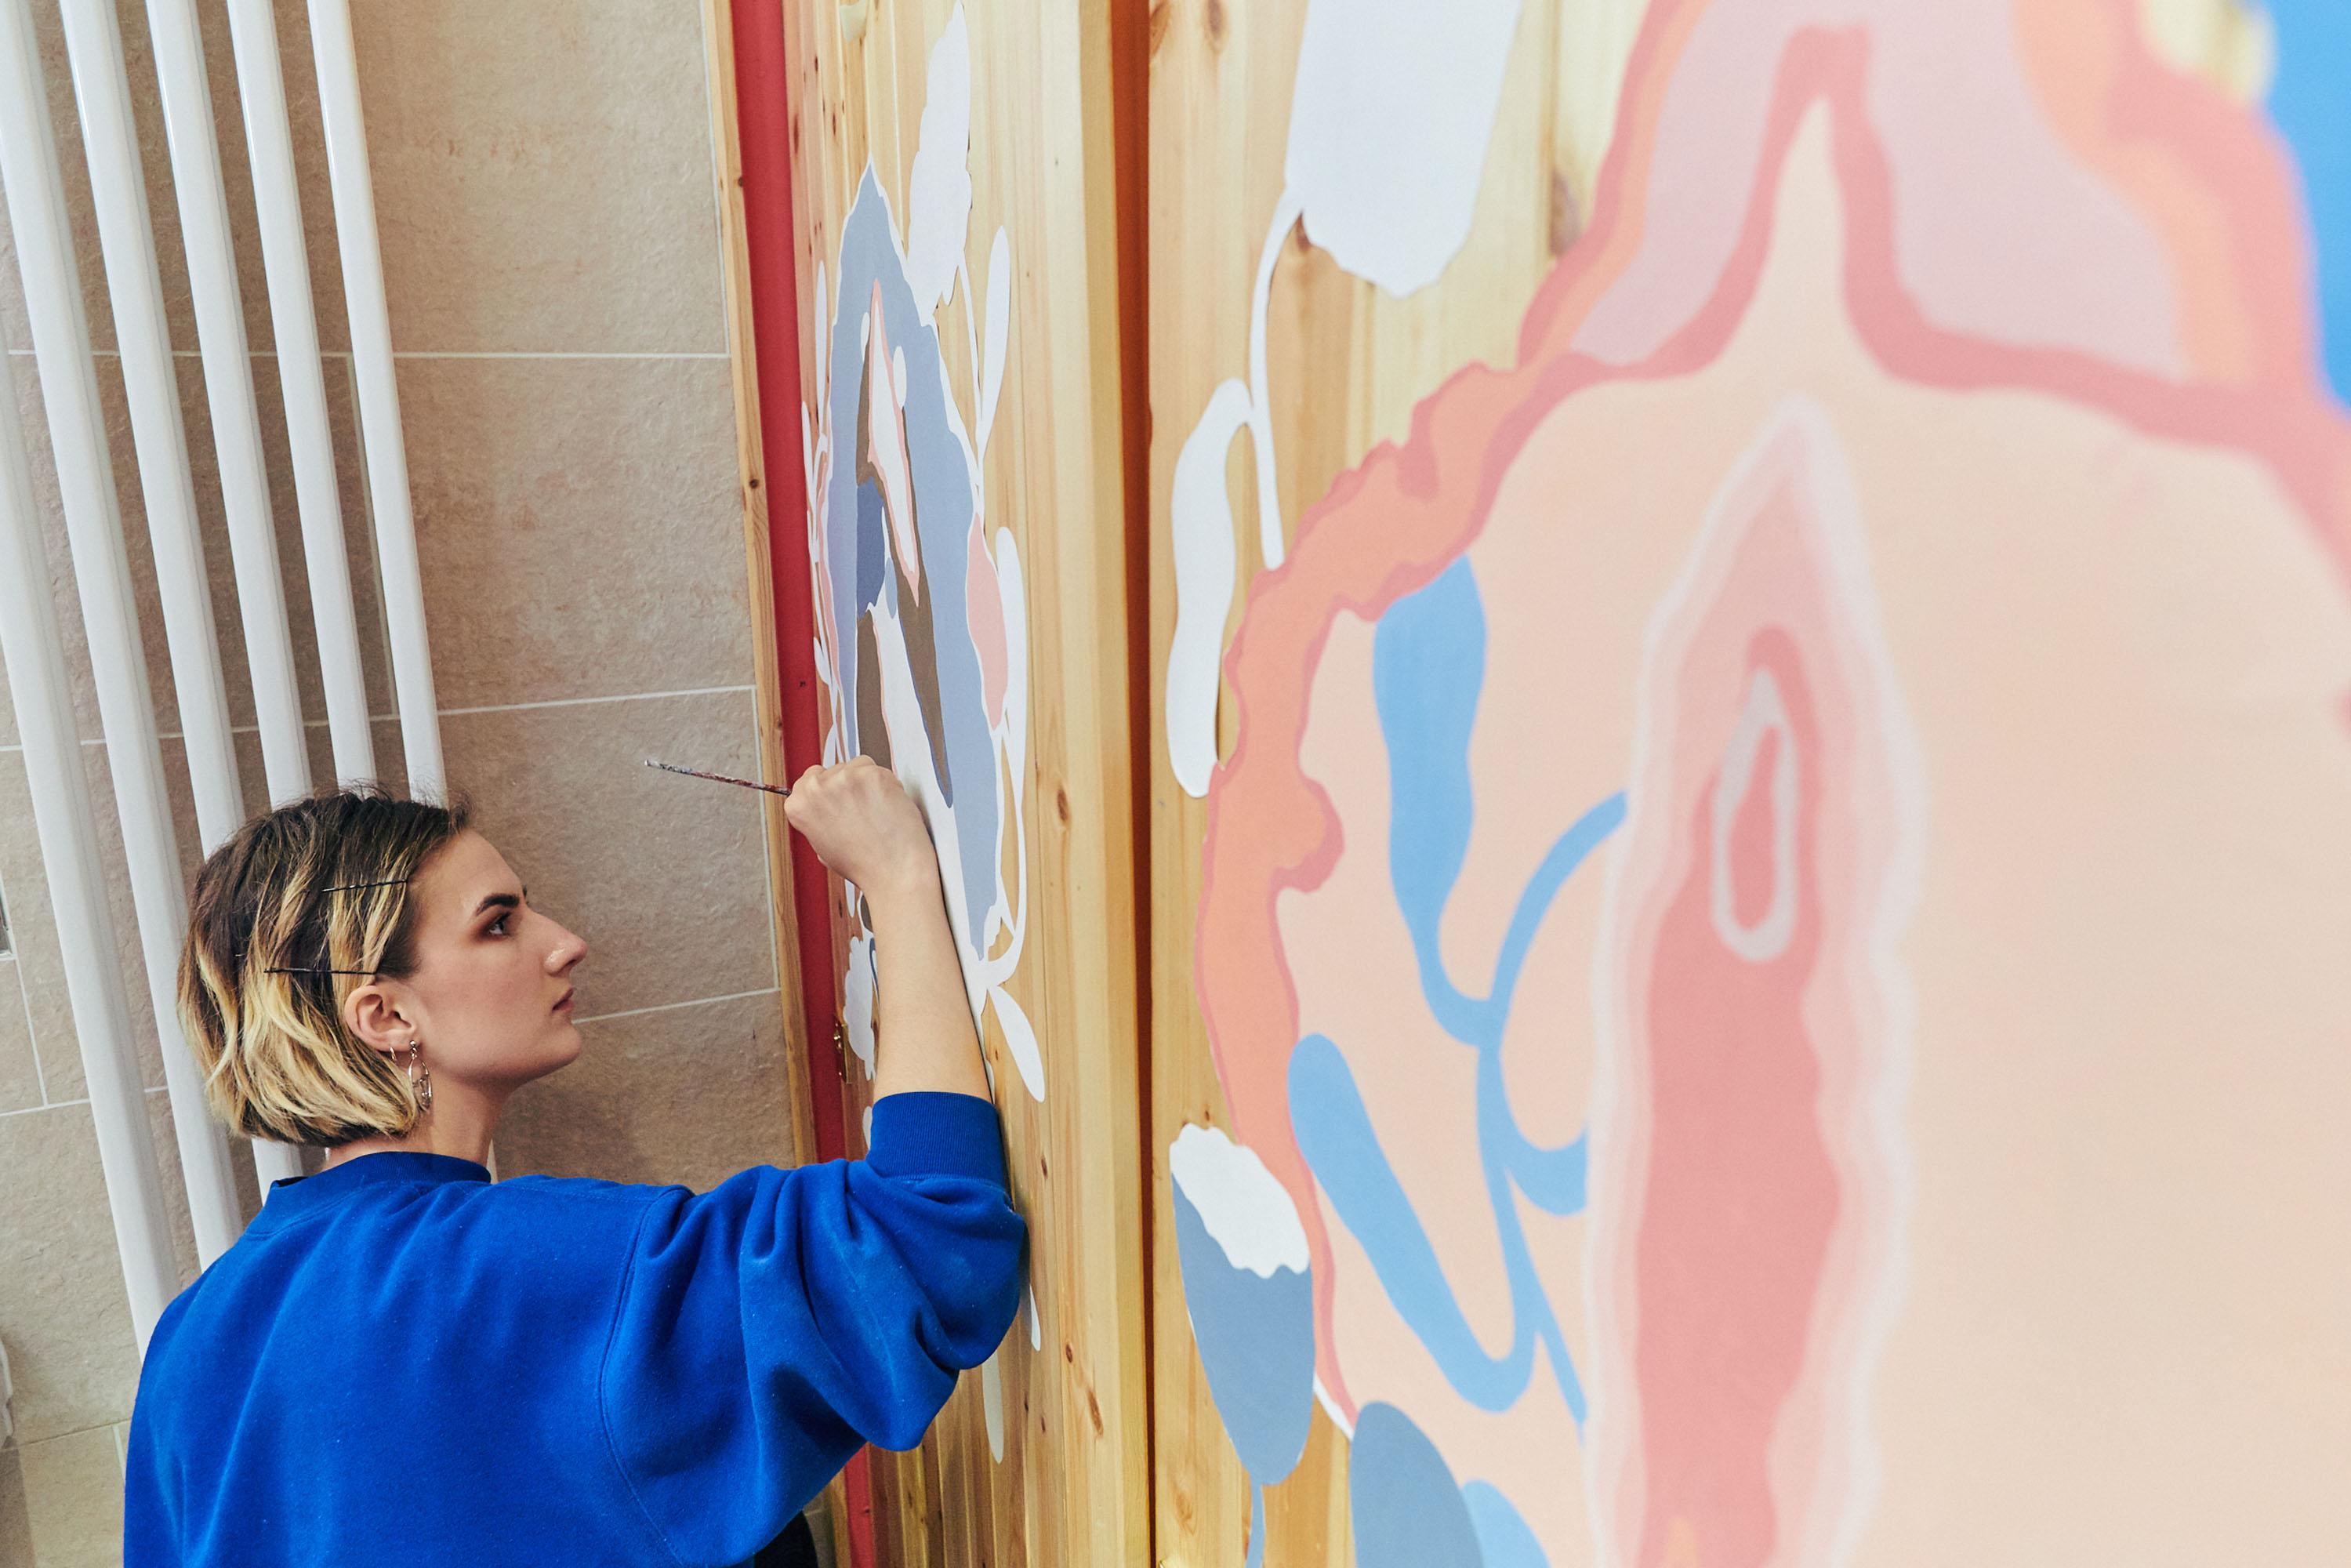 Vulva art is taking over penis doodles in bathrooms around London